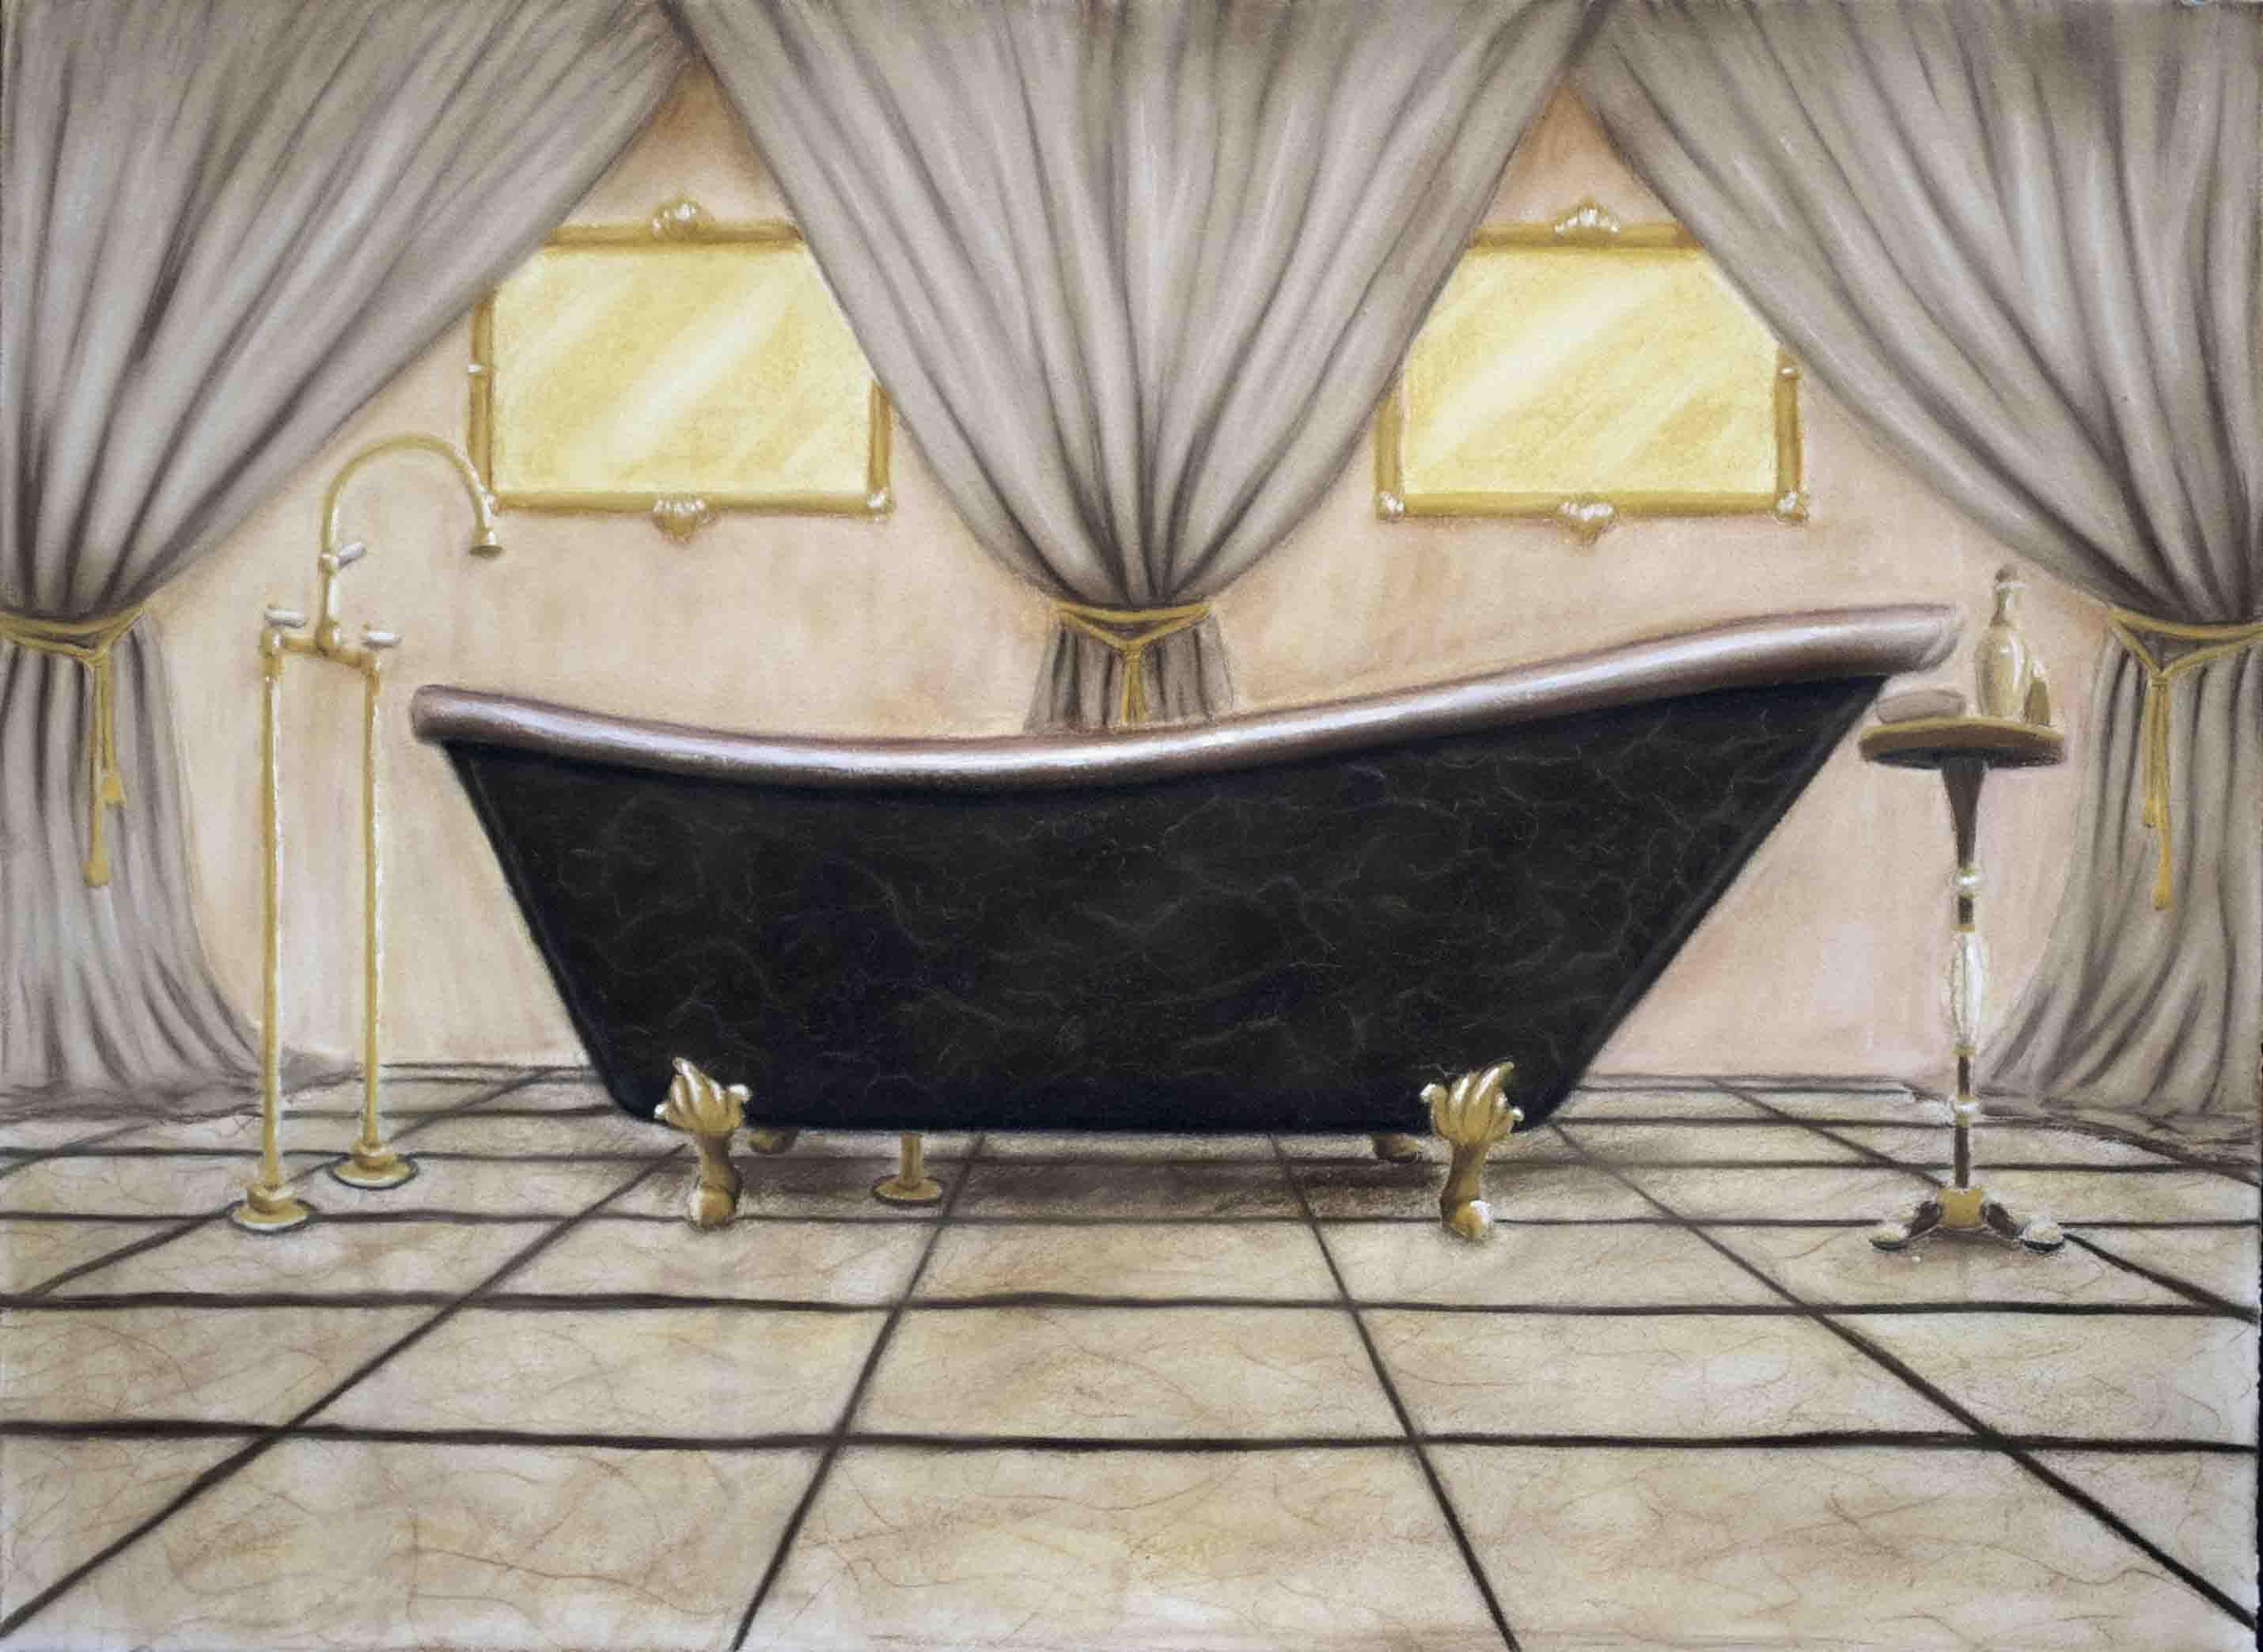 Wonderful Painting Bathtub Big Bathtub Refinishers Rectangular Painting A Tub Can I Paint My Bathtub Old Bathtub Refinishing Companies Green How To Paint Tub